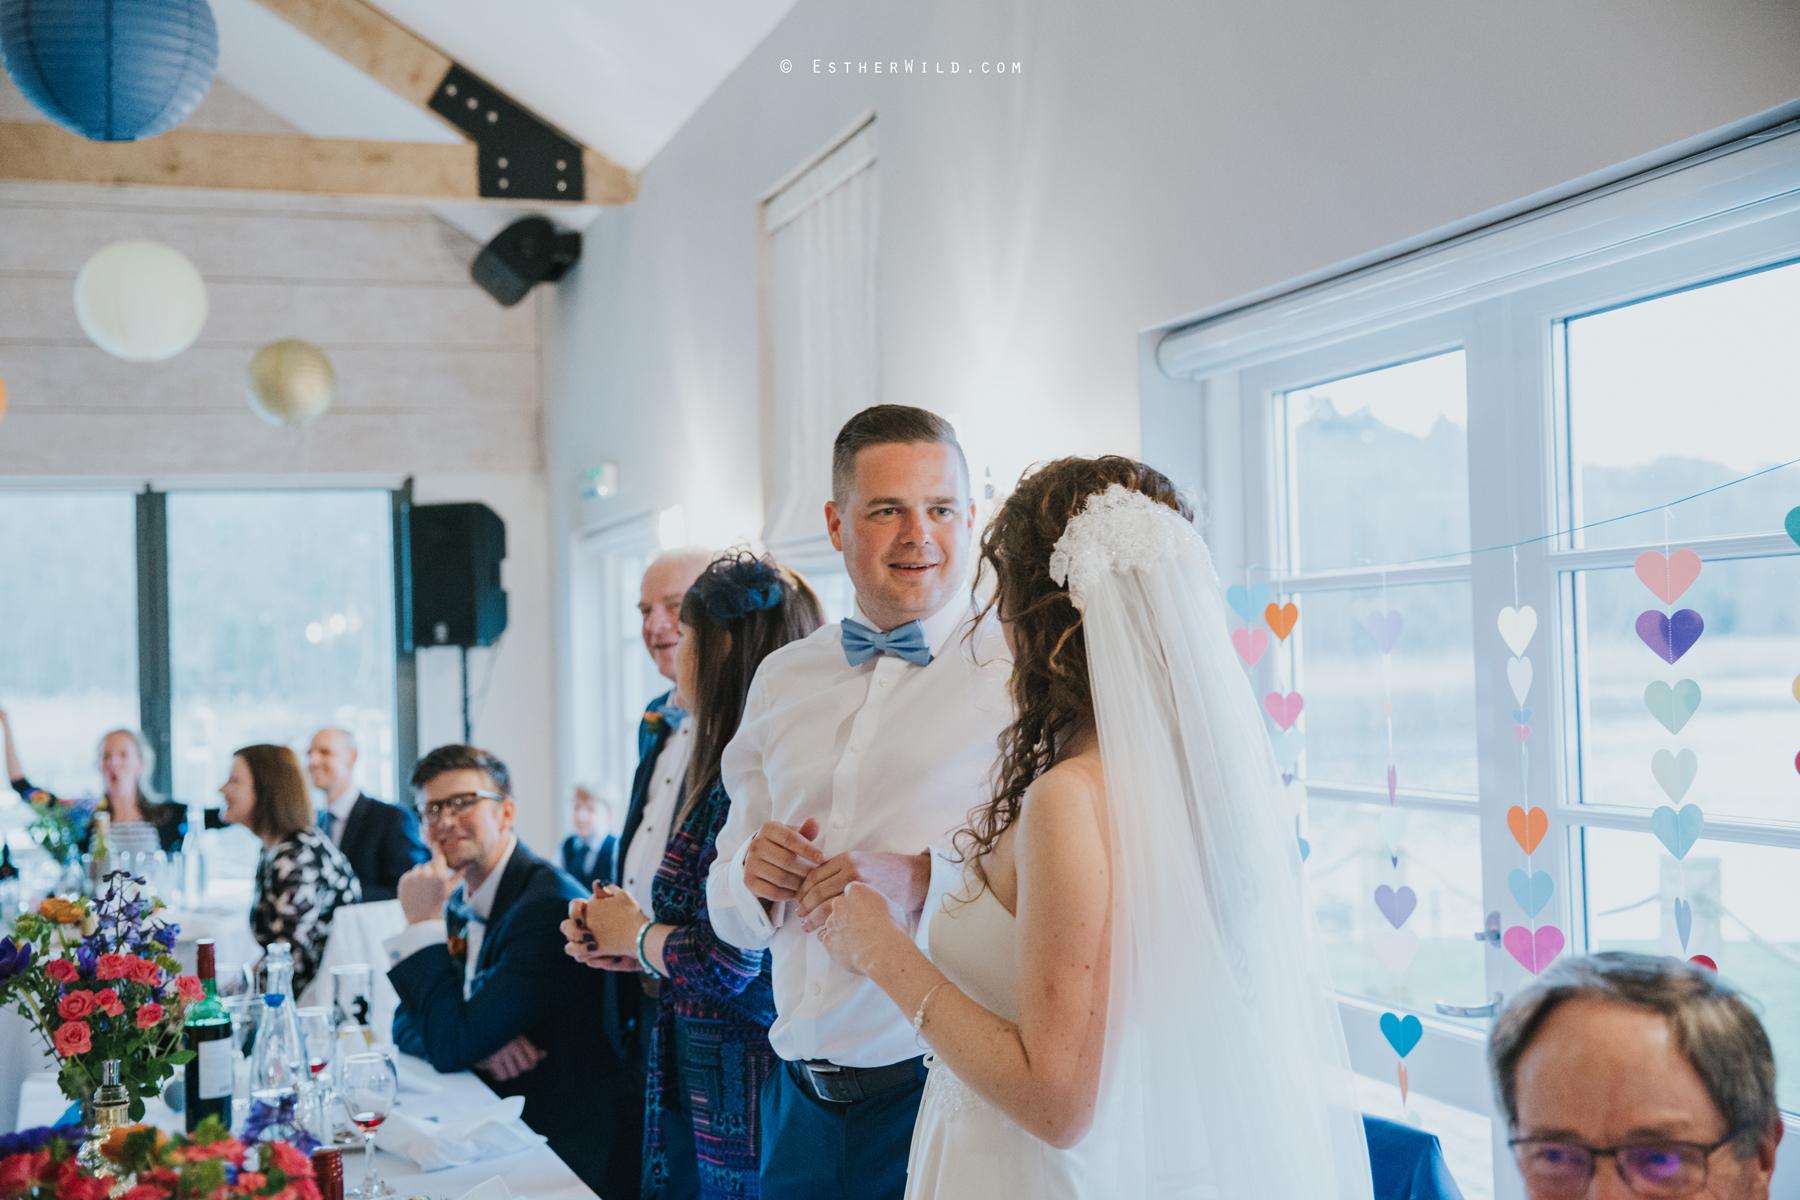 The_BoatHouse_Wedding_Venue_Ormesby_Norfolk_Broads_Boat_Wedding_Photography_Esther_Wild_Photographer_IMG_2458.jpg